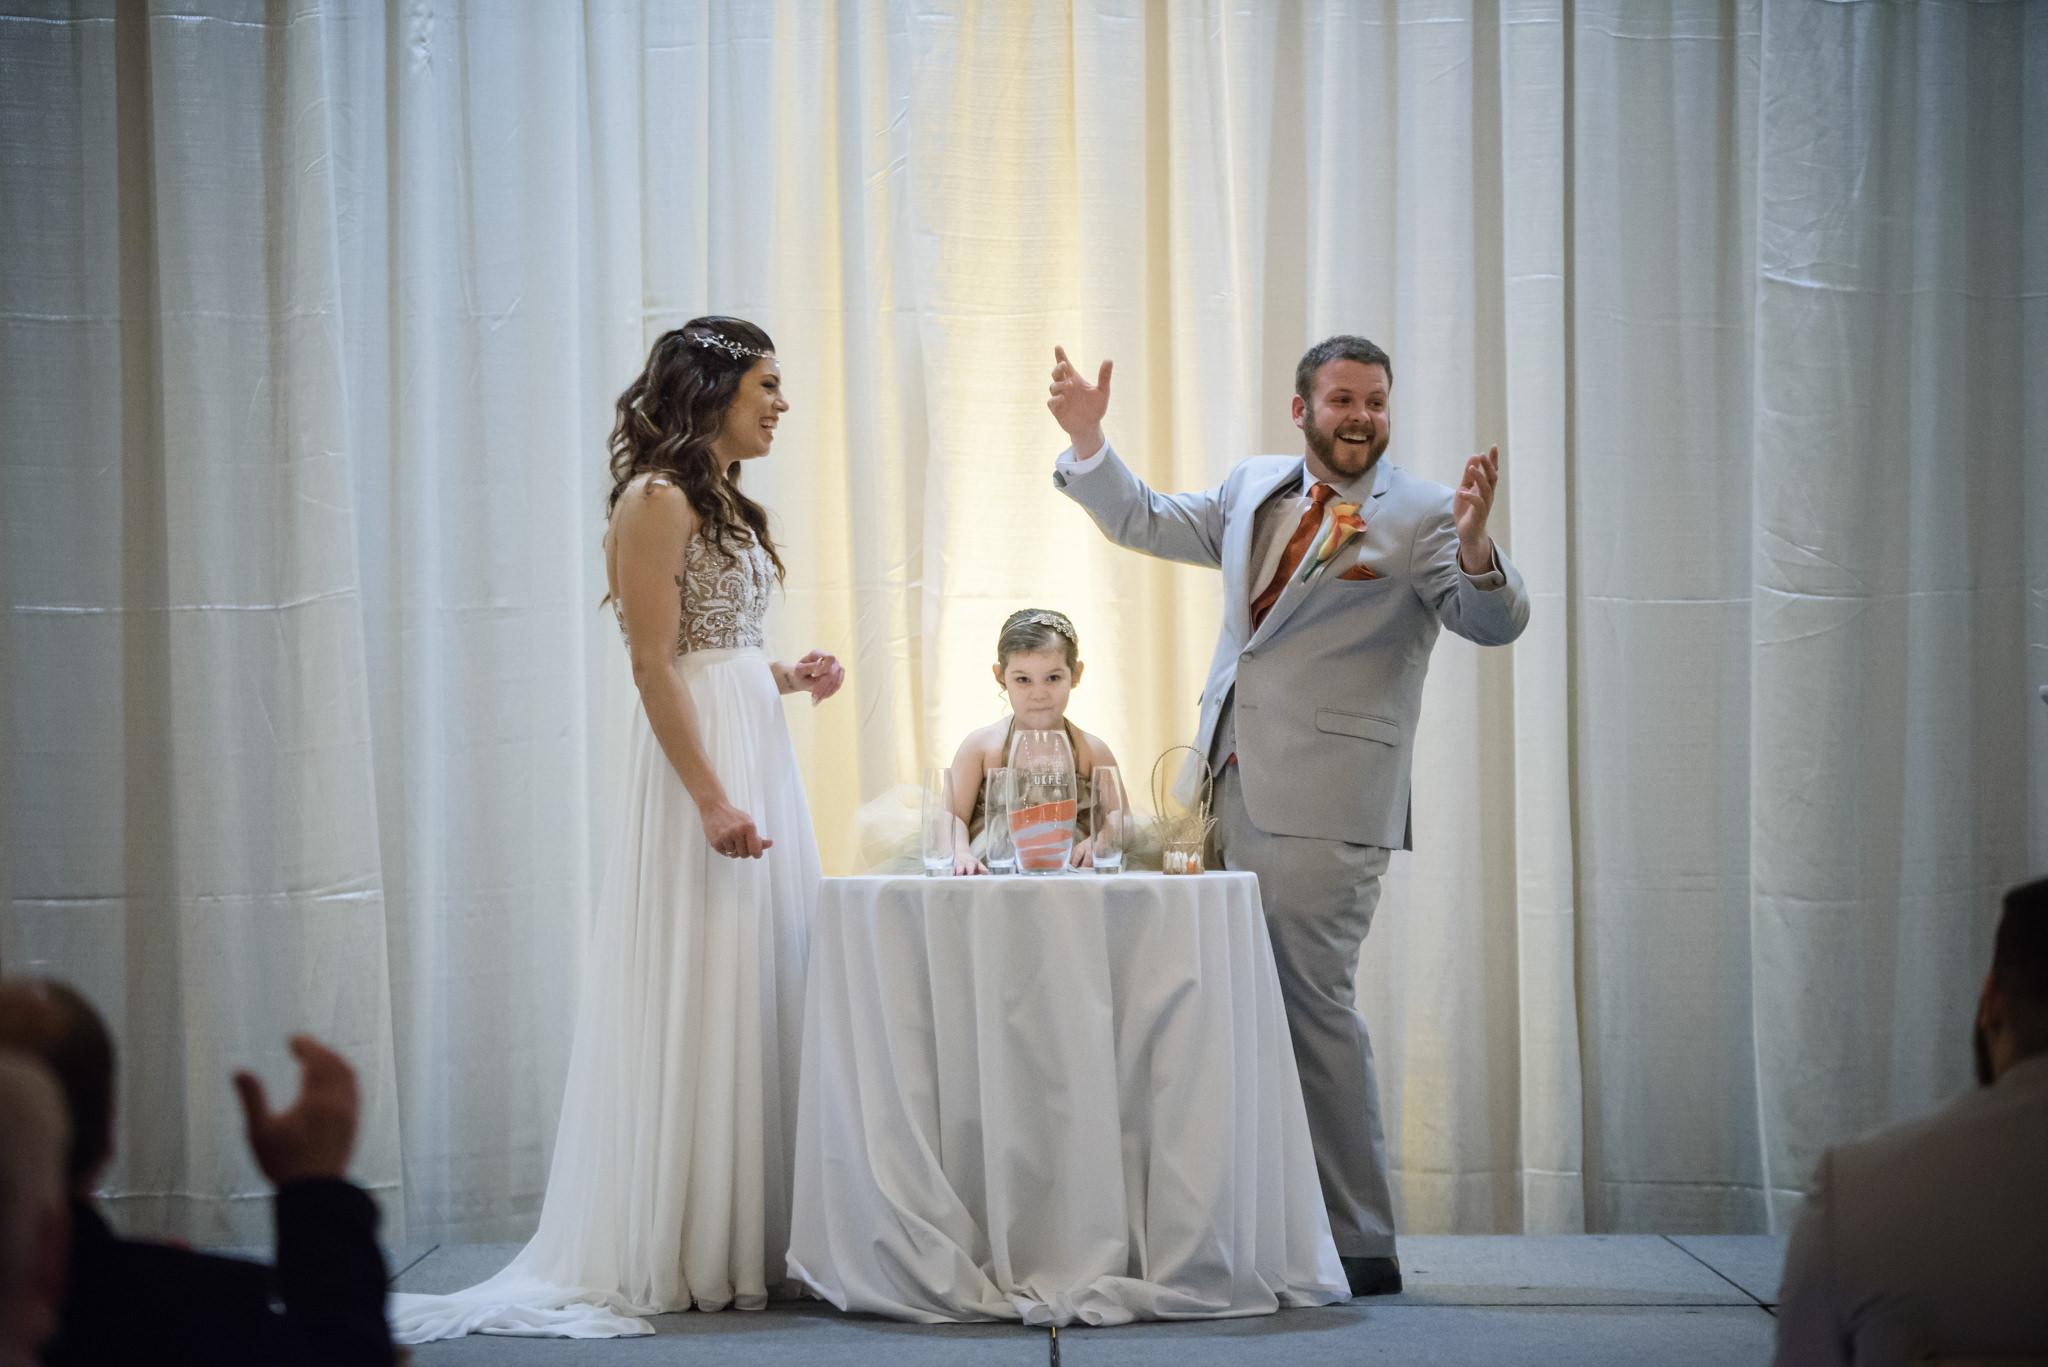 HILTON-OMAHA-WEDDING-PHOTOGRAPHER-JM-STUDIOS-OMAHA-LIV-BRICE-025.jpg